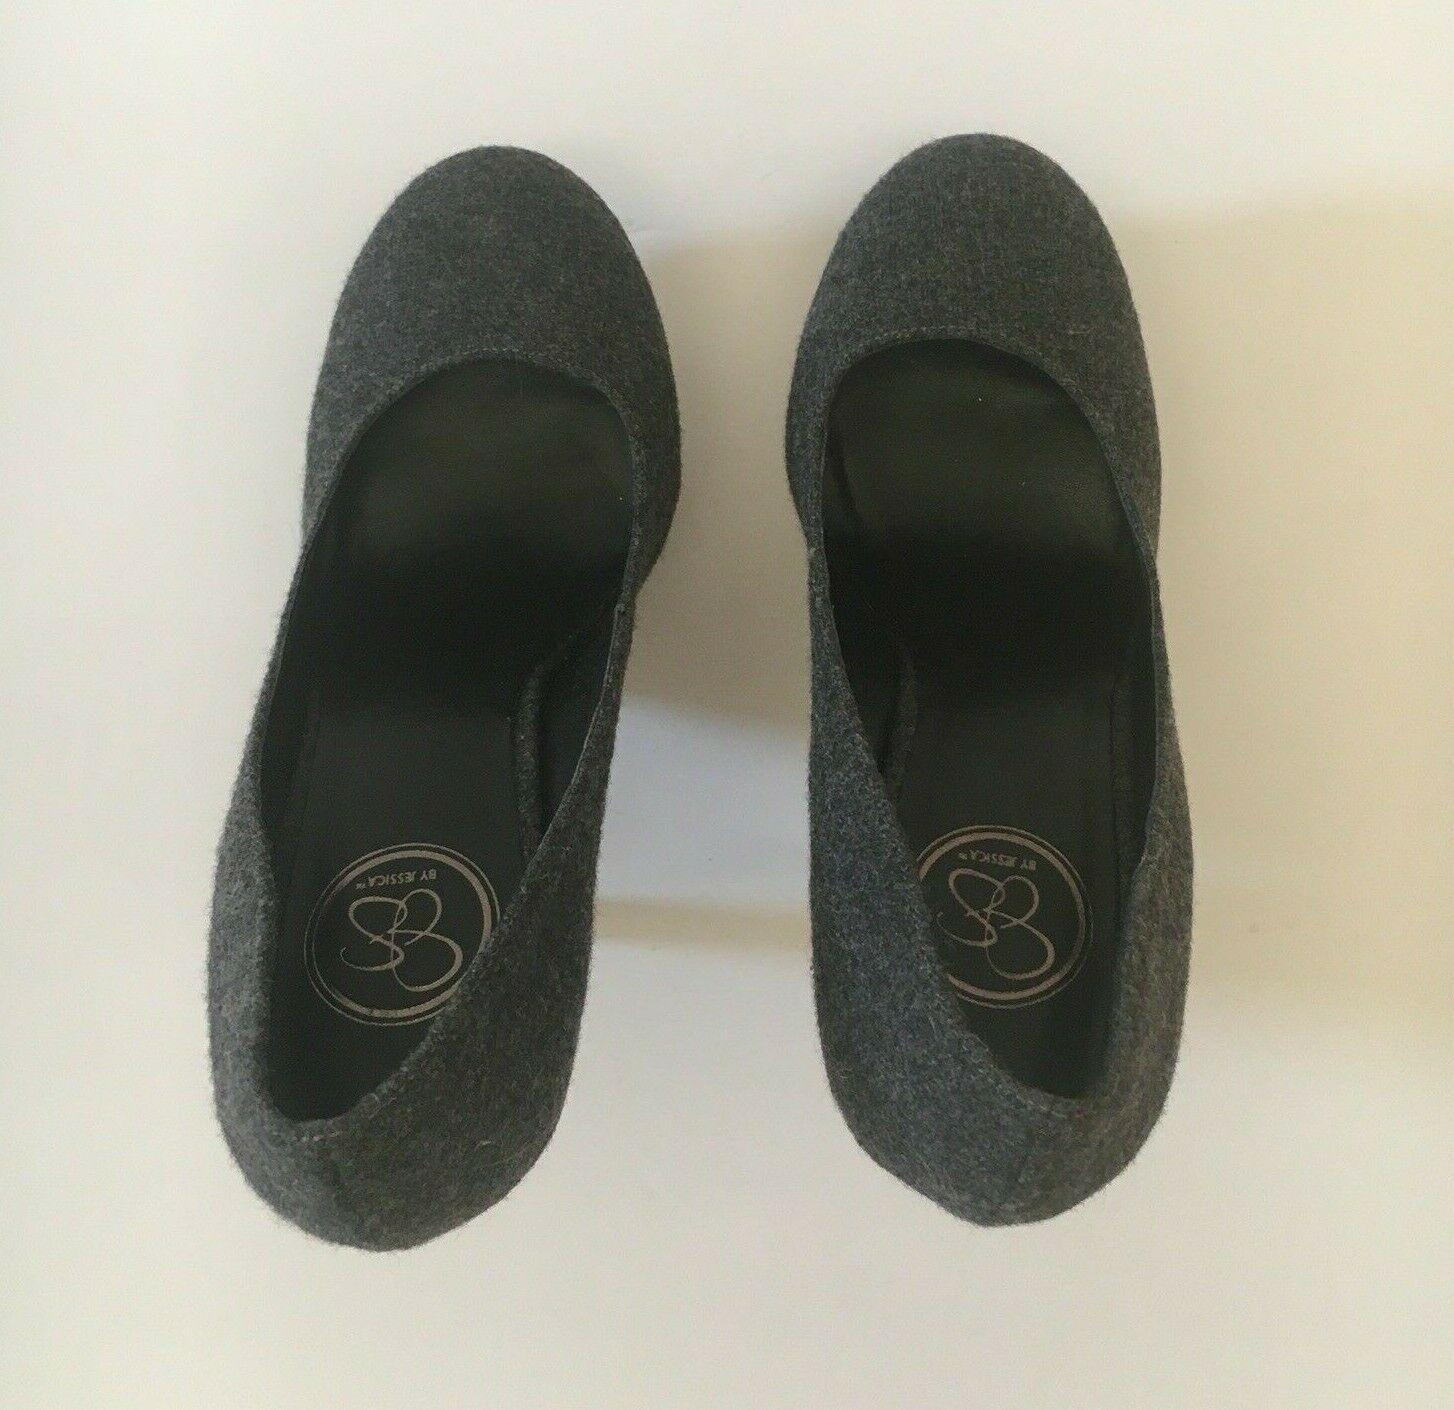 Jessica Simpson Gracex Gray Wool Round Toe Platform Pumps Heels Size 7.5 M  image 3